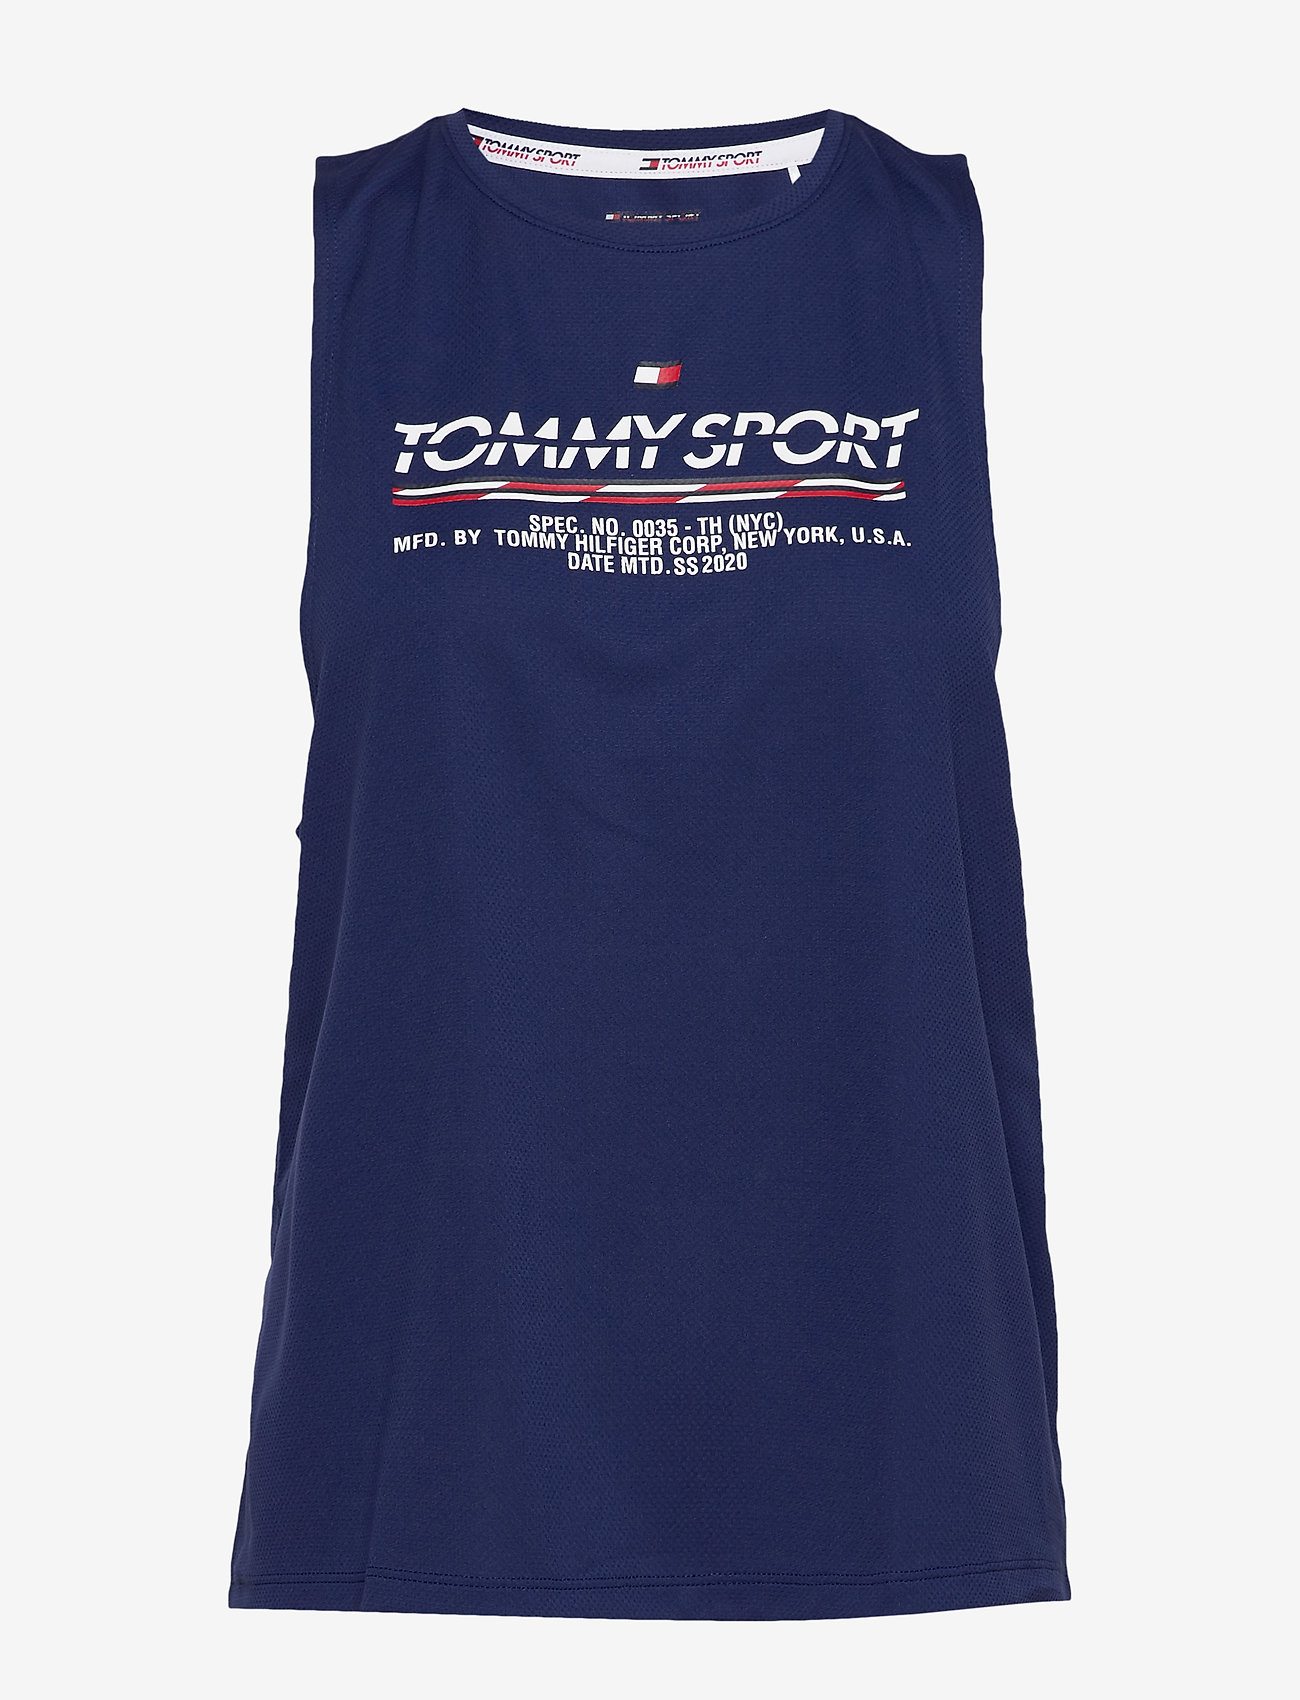 Tommy Sport - PRINTED TANK TOP - tank tops - blue ink - 0